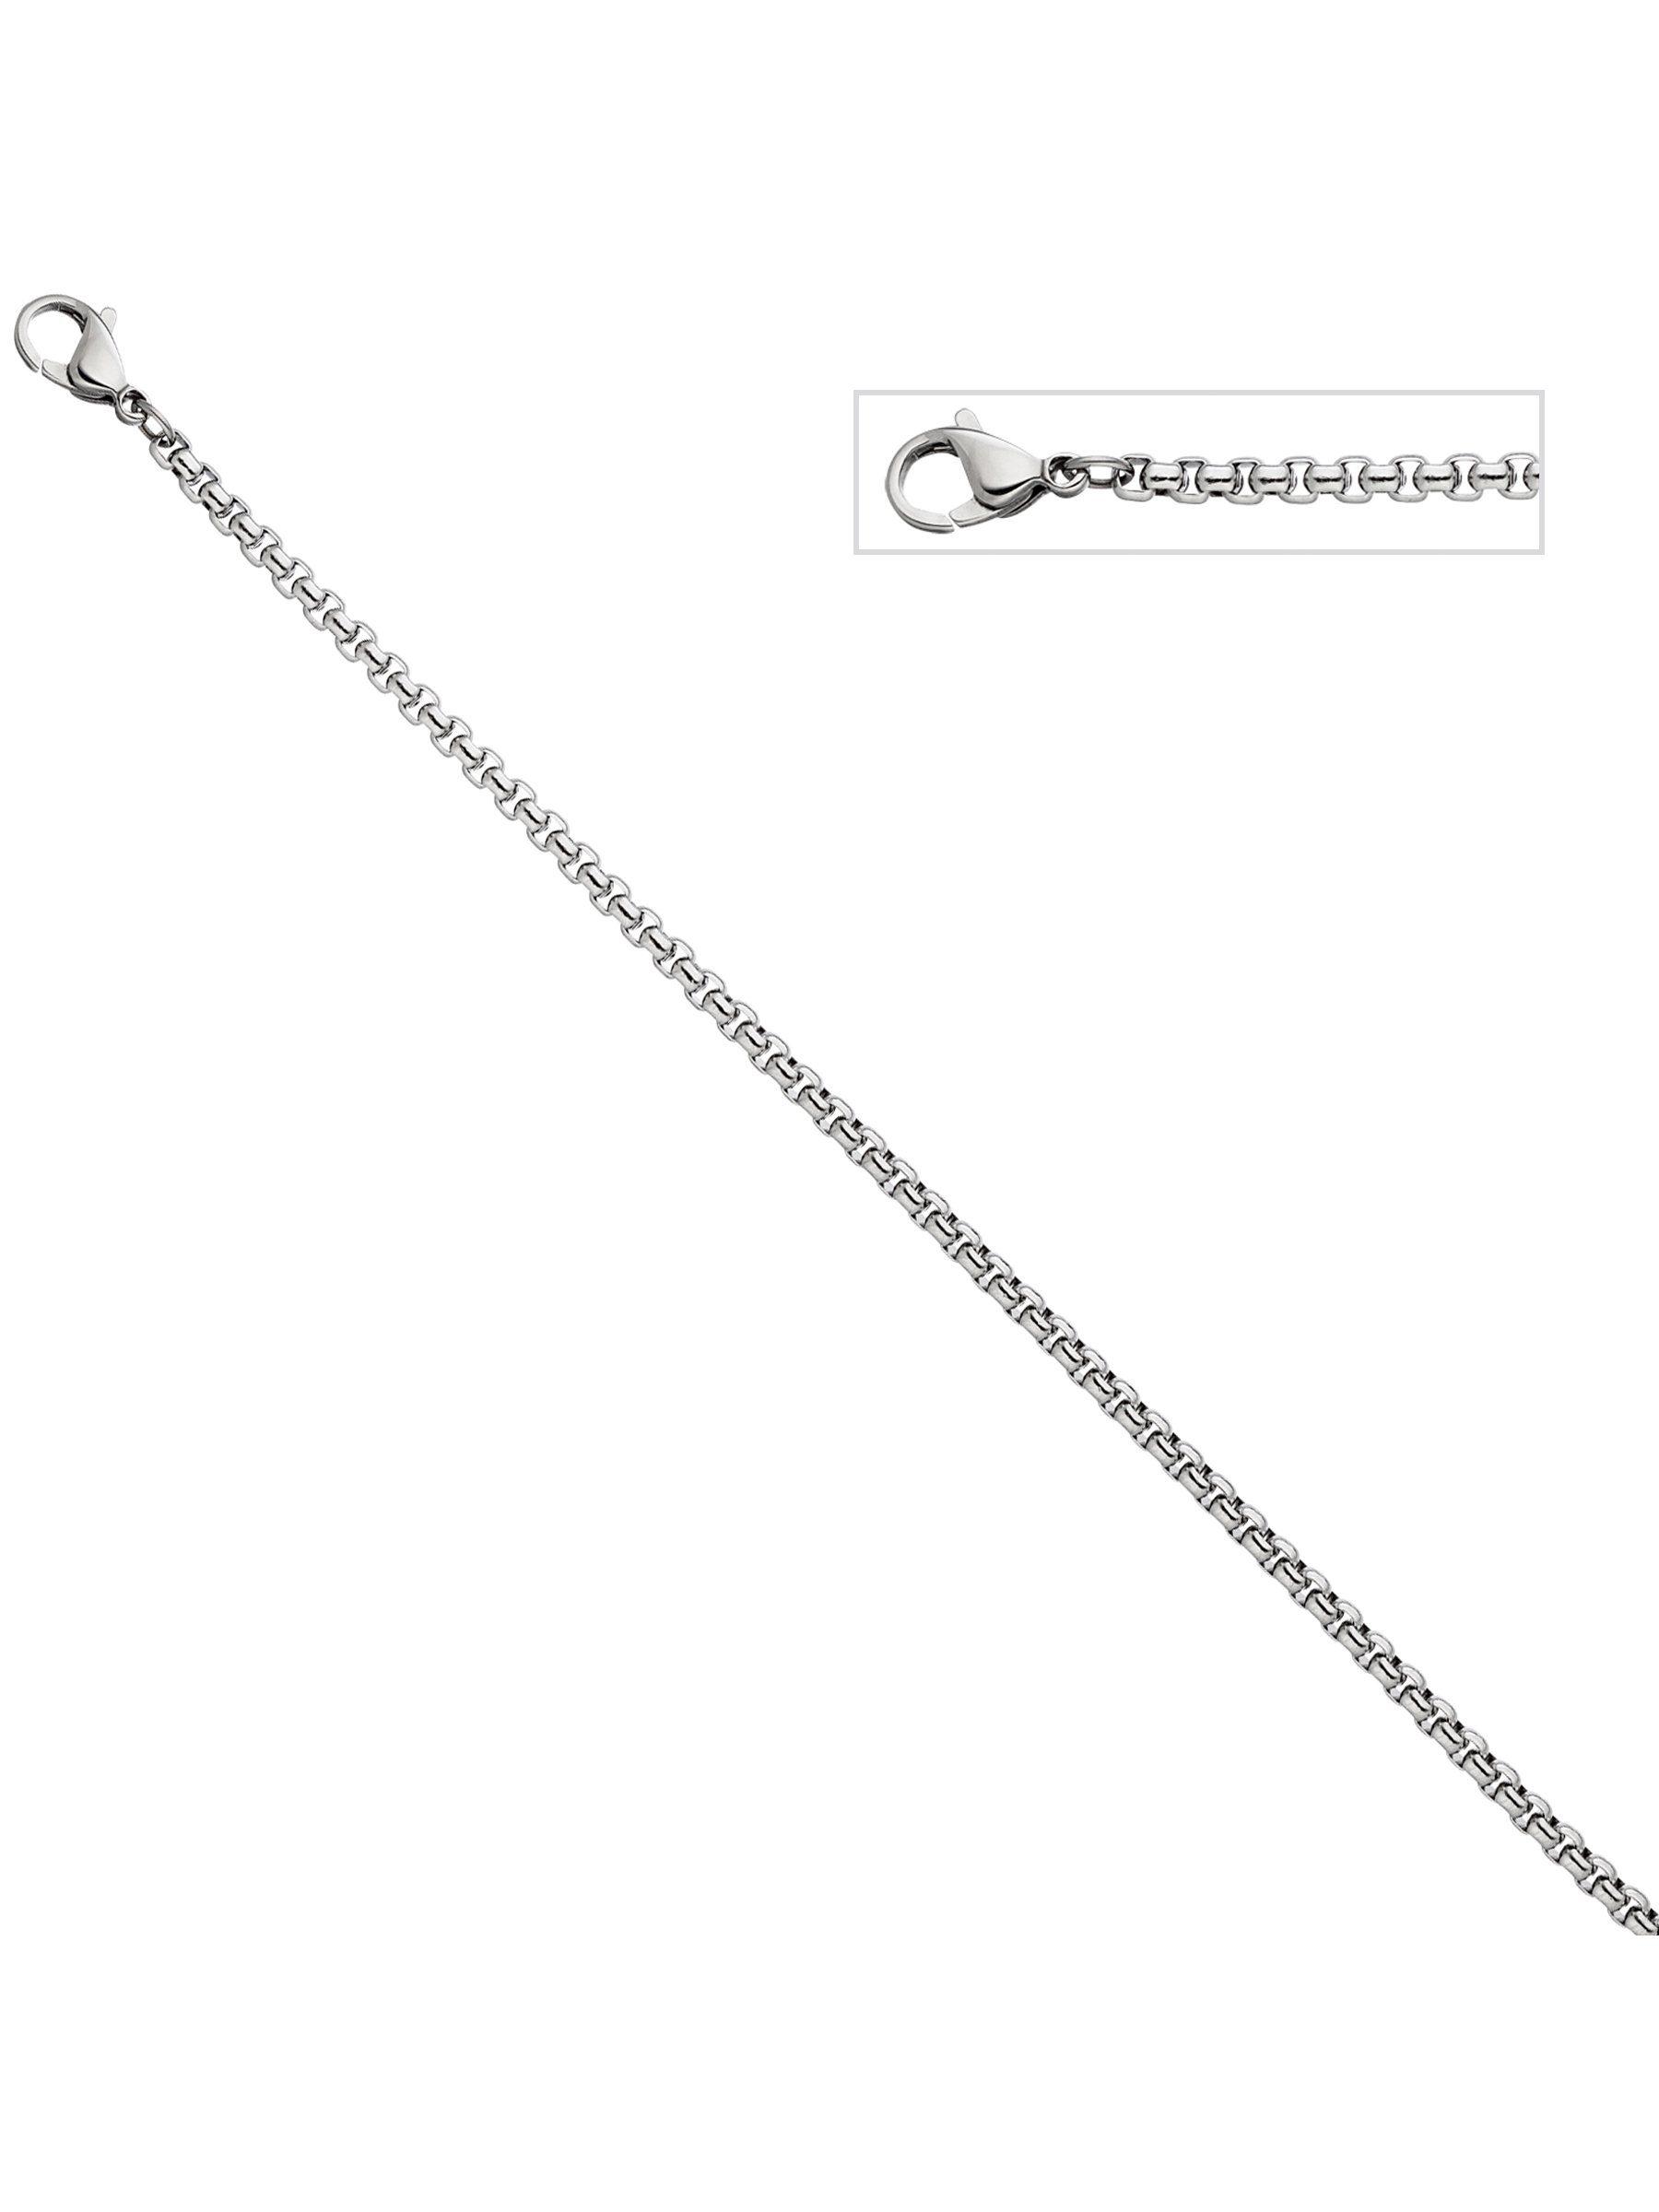 Adelia´s Kette ohne Anhänger »Venezianierkette« Edelstahl L - 45 cm